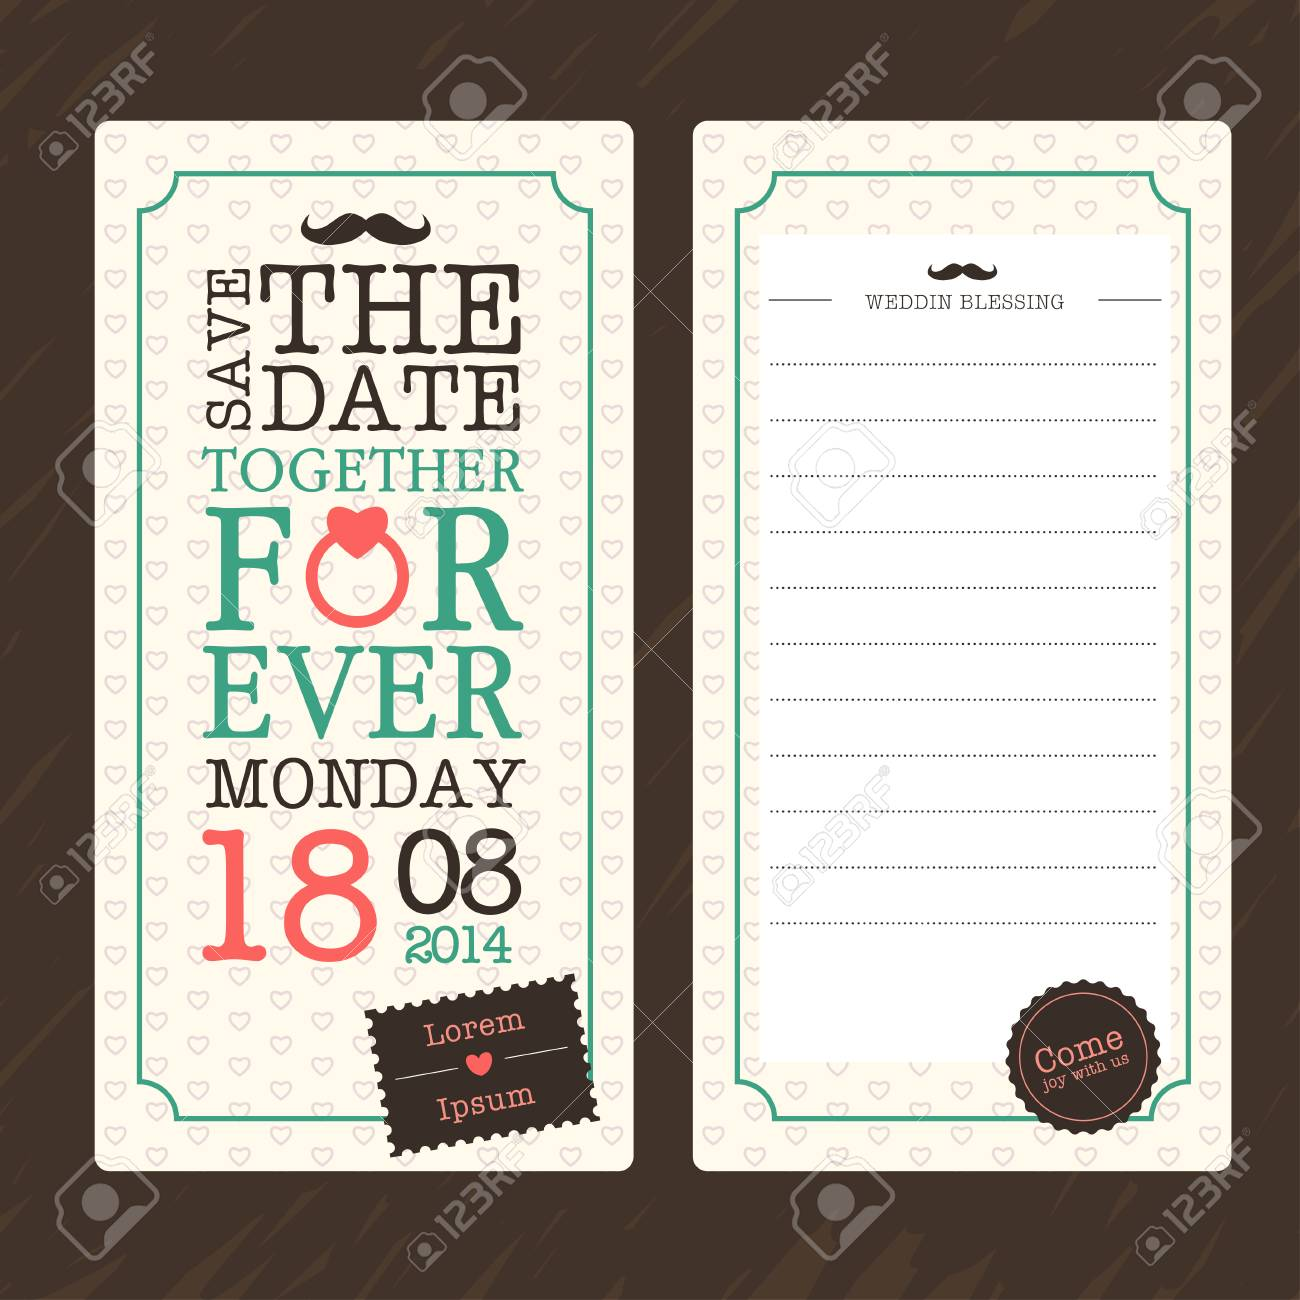 Vintage Ticket Wedding Invitation Card Template Royalty Free